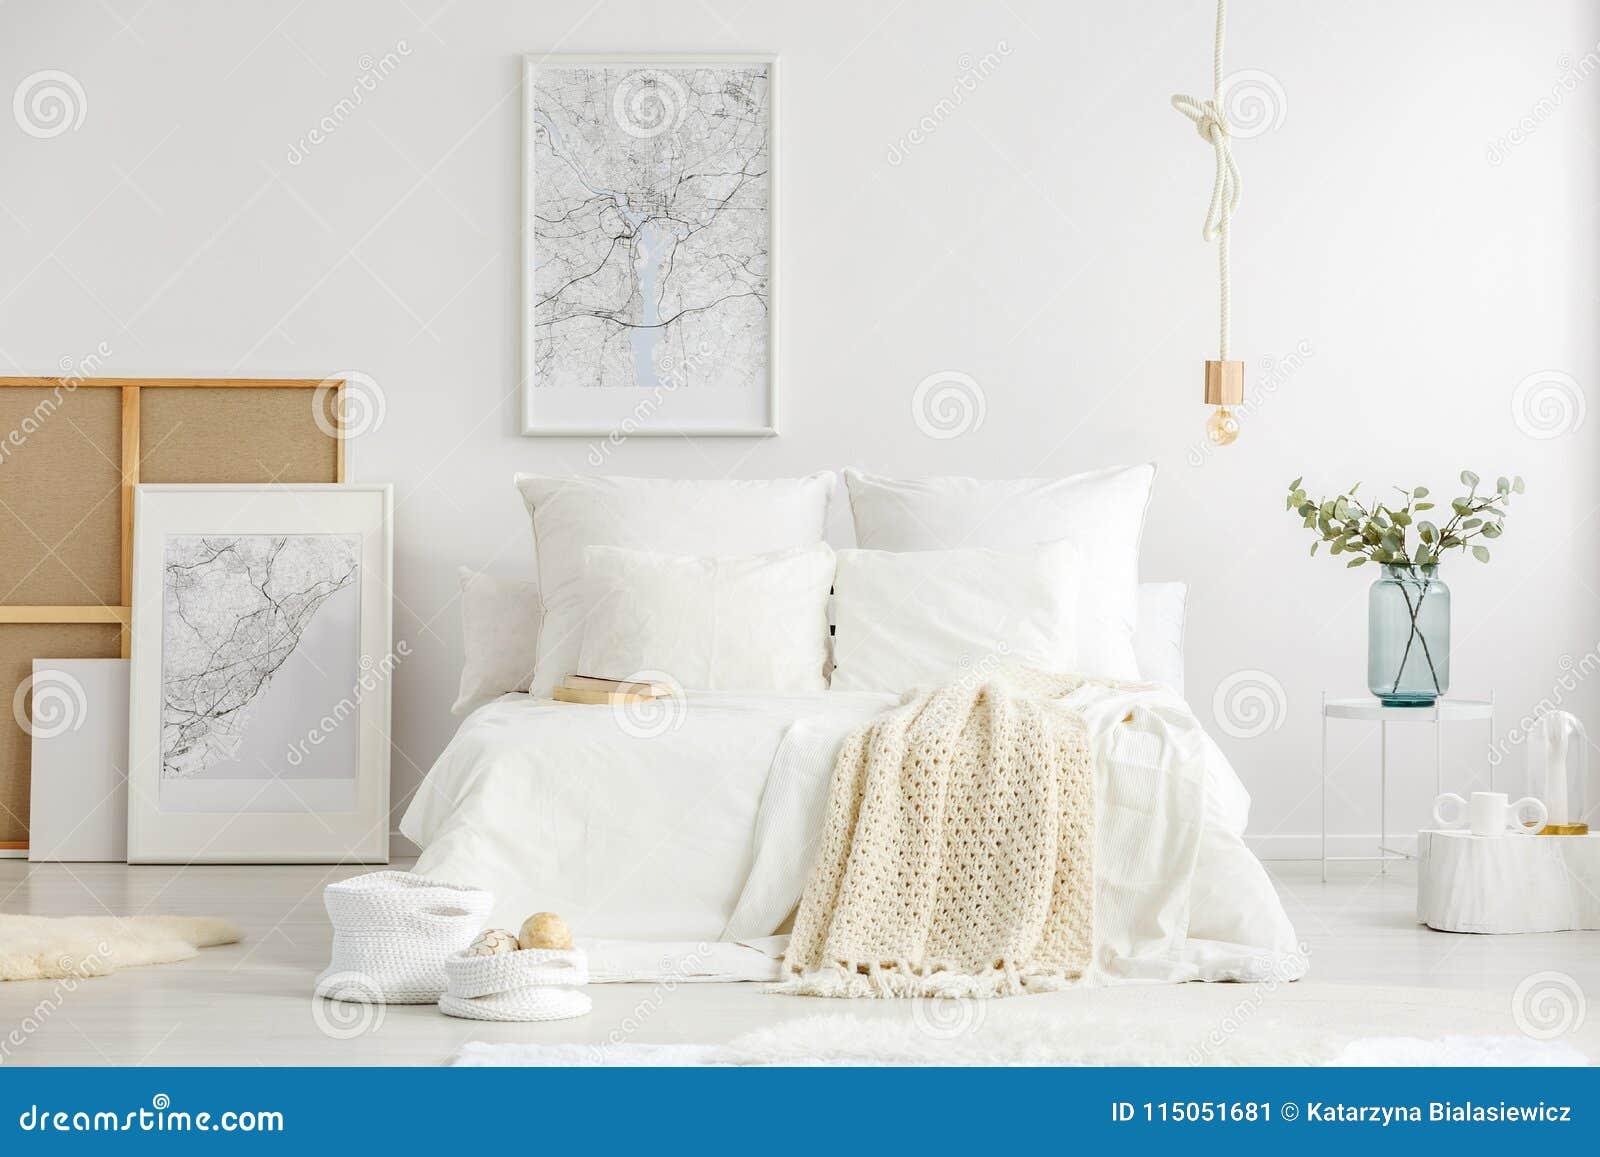 White Minimalist Master Bedroom Interior Stock Image - Image of ...